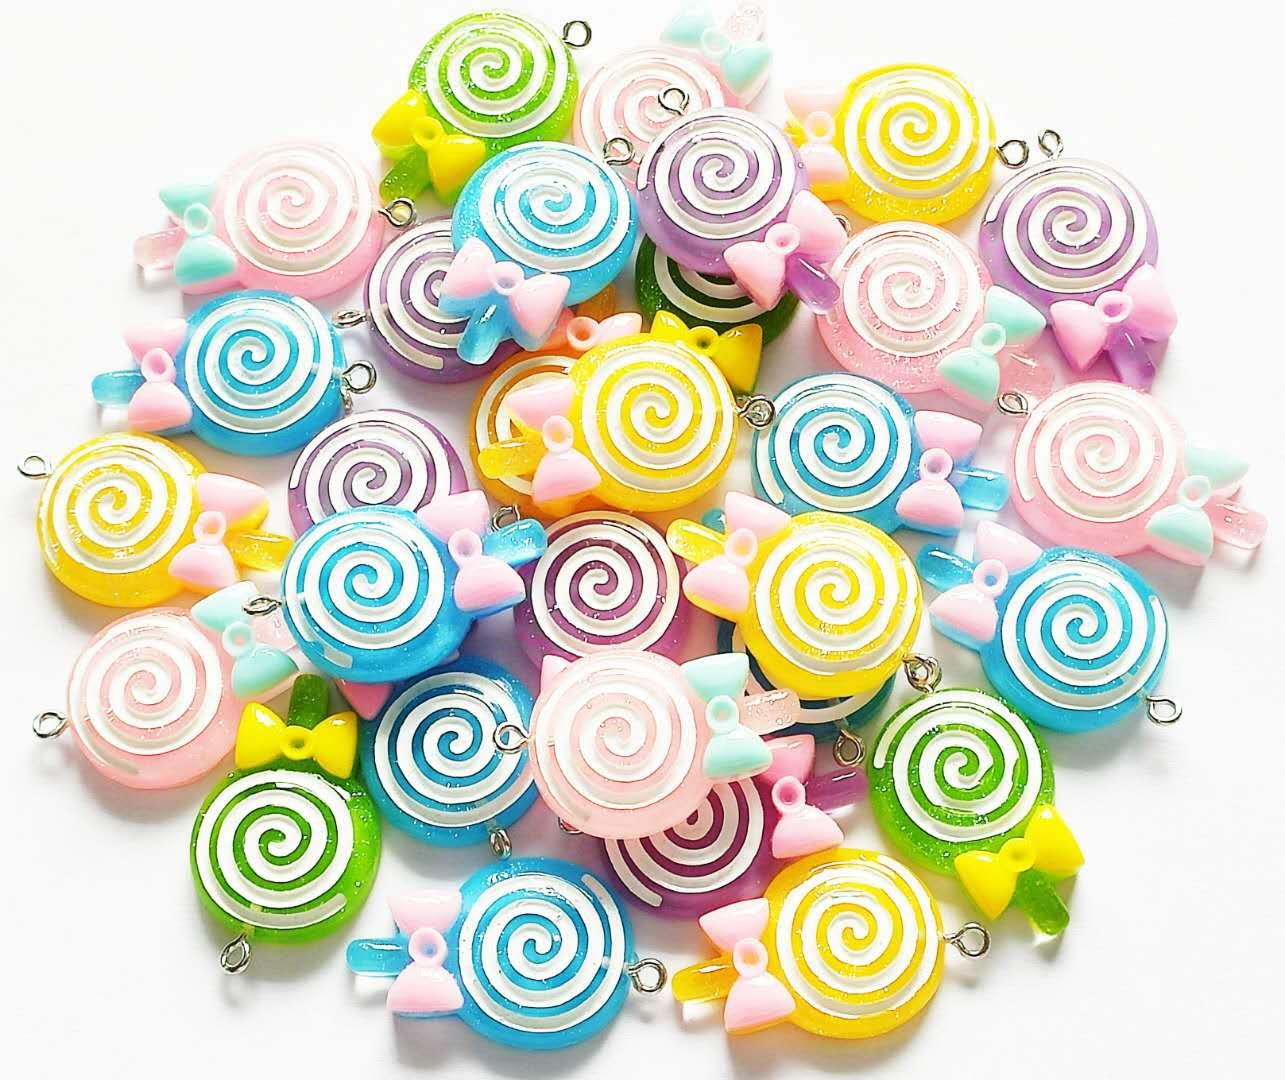 100 stücke Gemischt Lollipop Charms Abgeholt zufällig T026